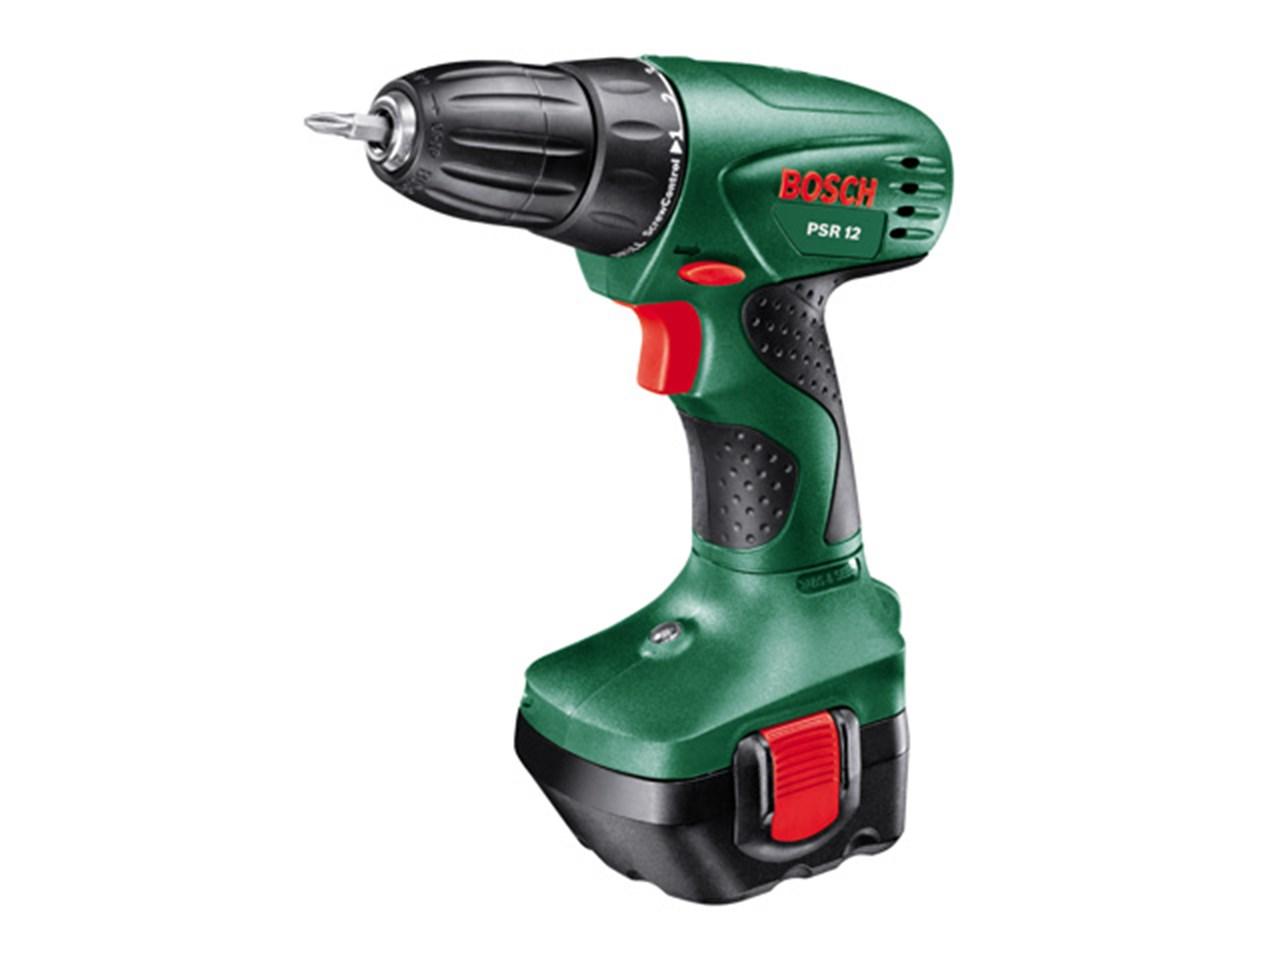 Bosch Green PSR12 12v Cordless Drill Driver